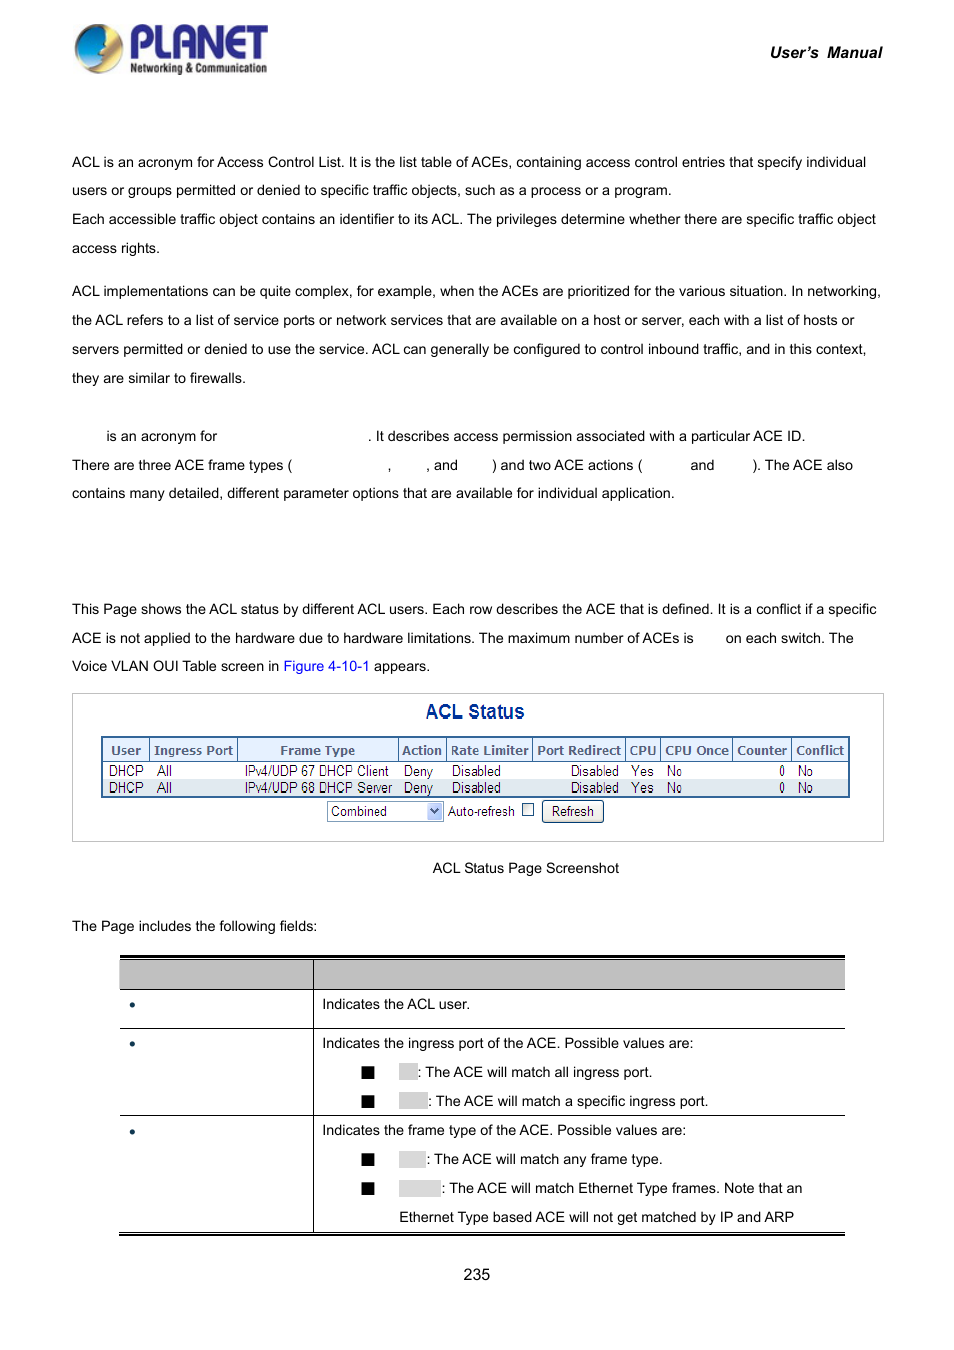 10 access control list, 1 access control list status